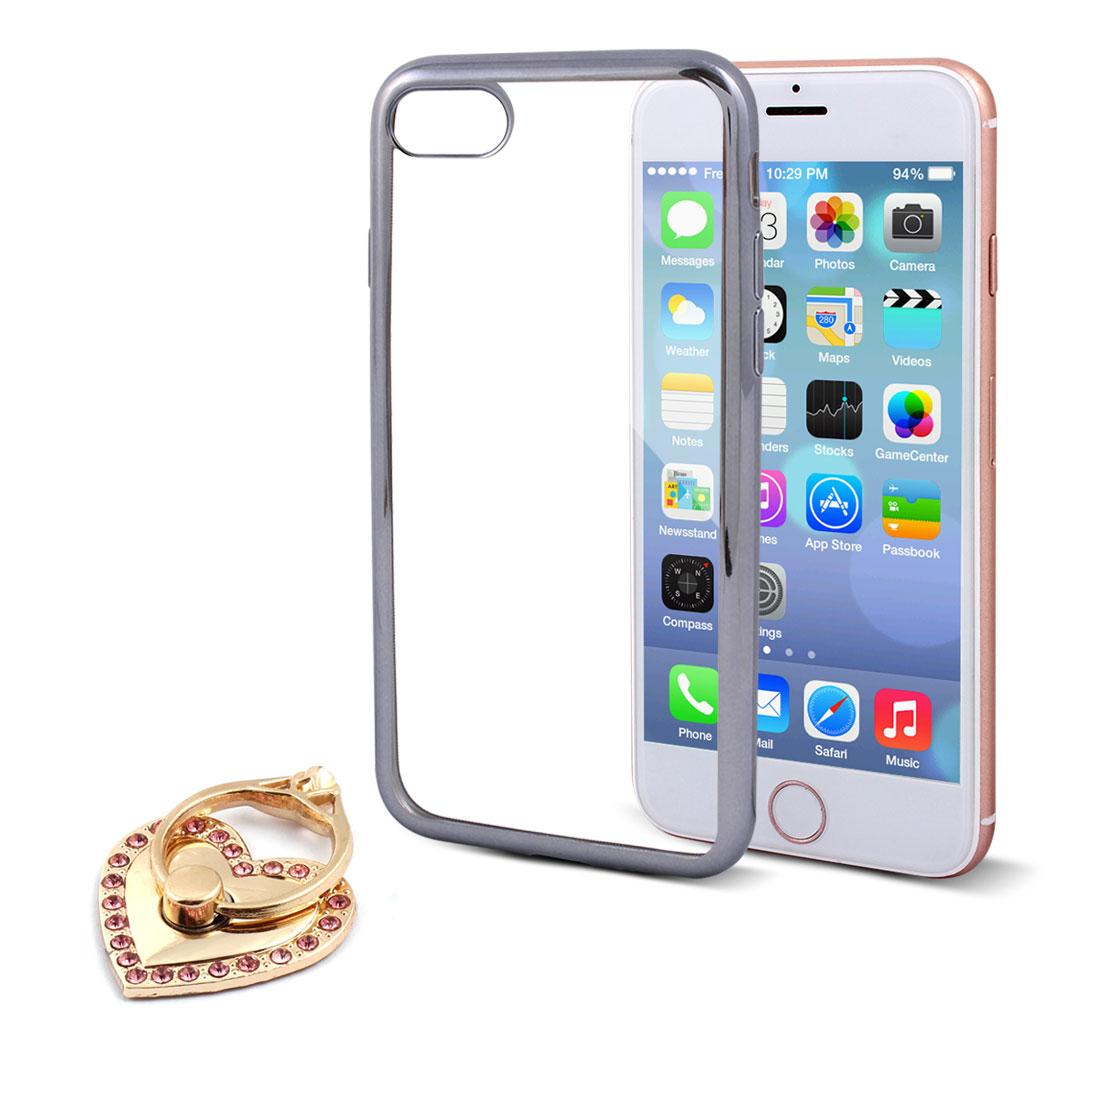 Phone Shatter Resistant Case Gray w Rhinestones Finger Ring Holder for iPhone 7